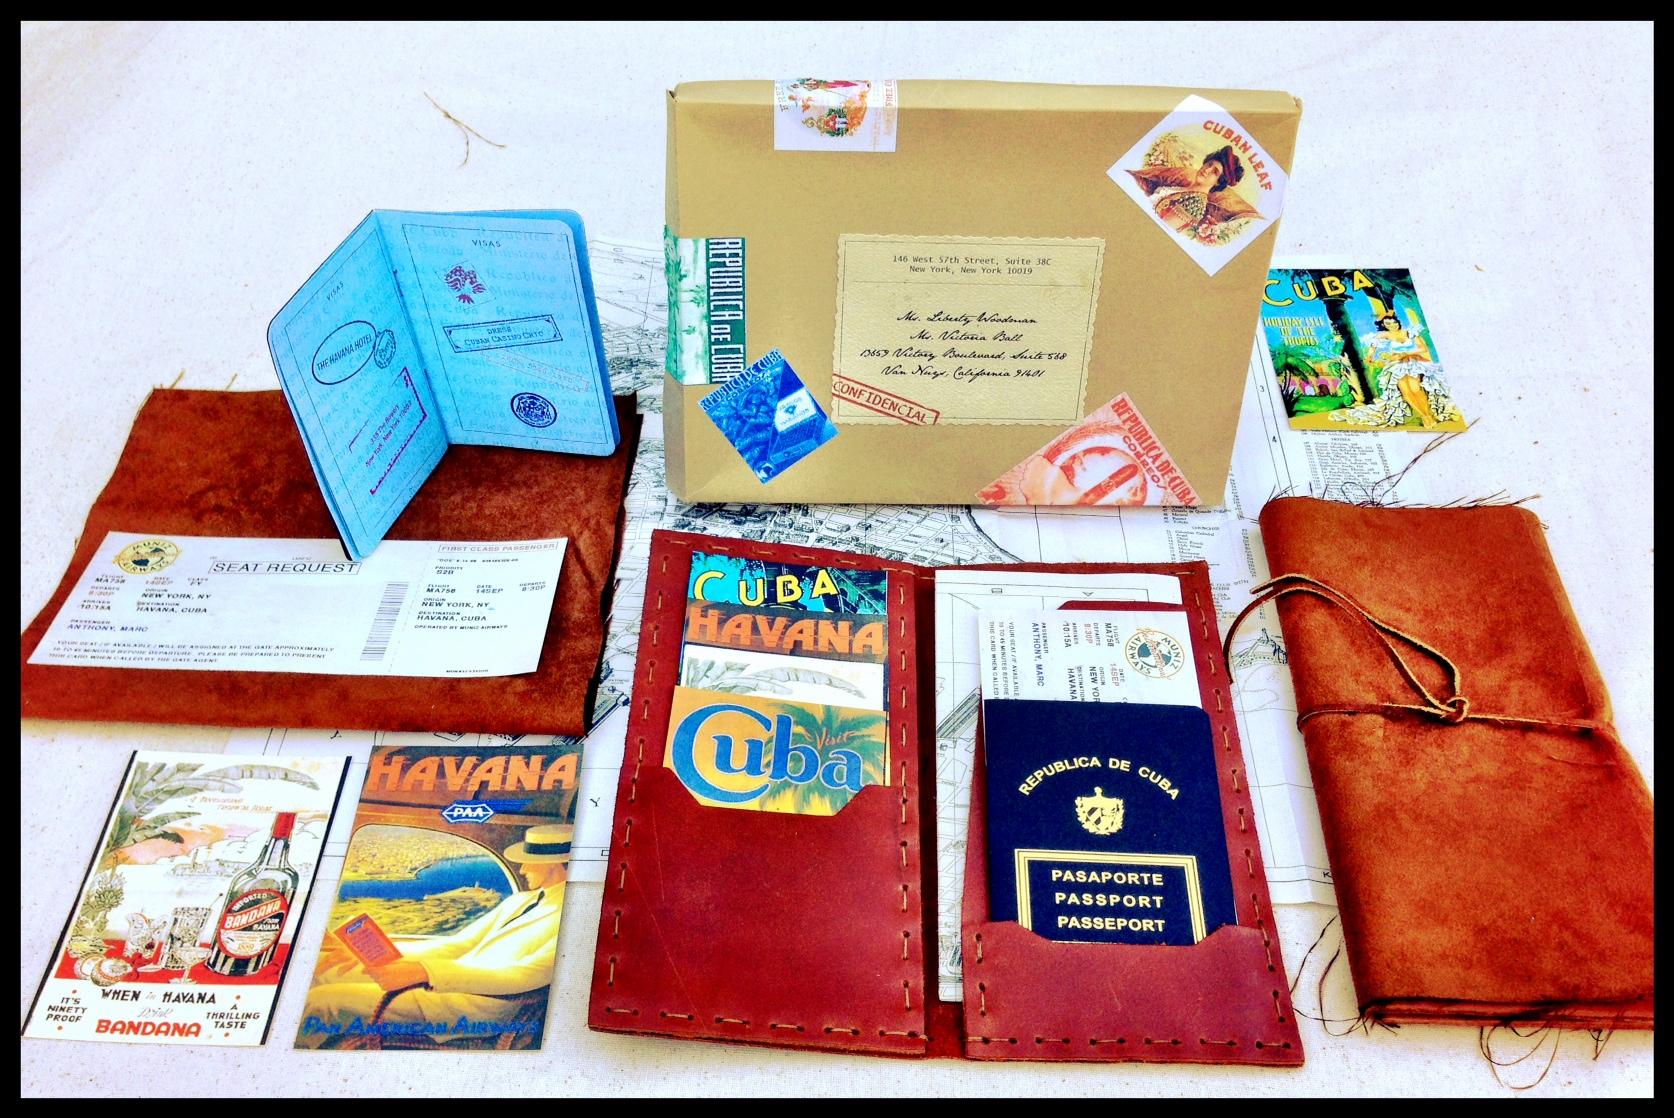 004.Marc Anthony borthday, Havana nights, custom inviations, passport invitations, plane ticket invitation, custom leather travel wallet.JPG